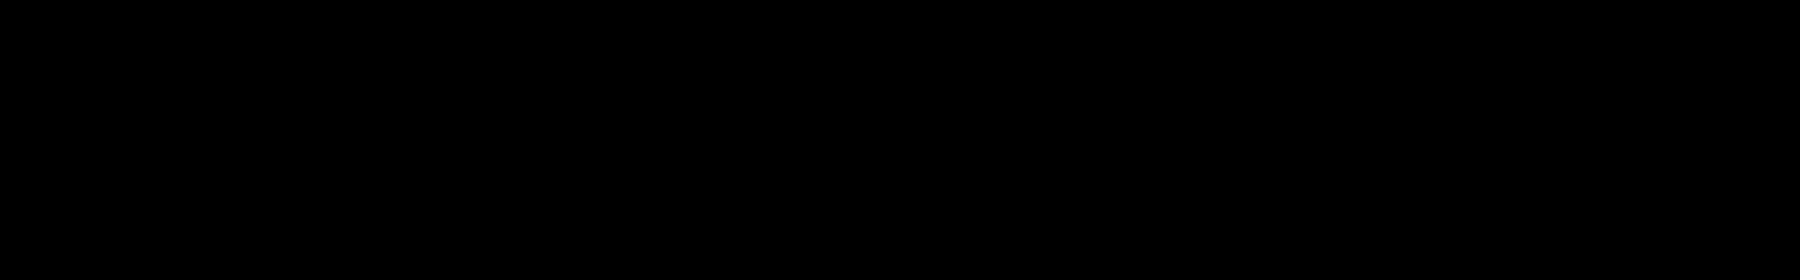 Jon Sine: Analog House #2 audio waveform